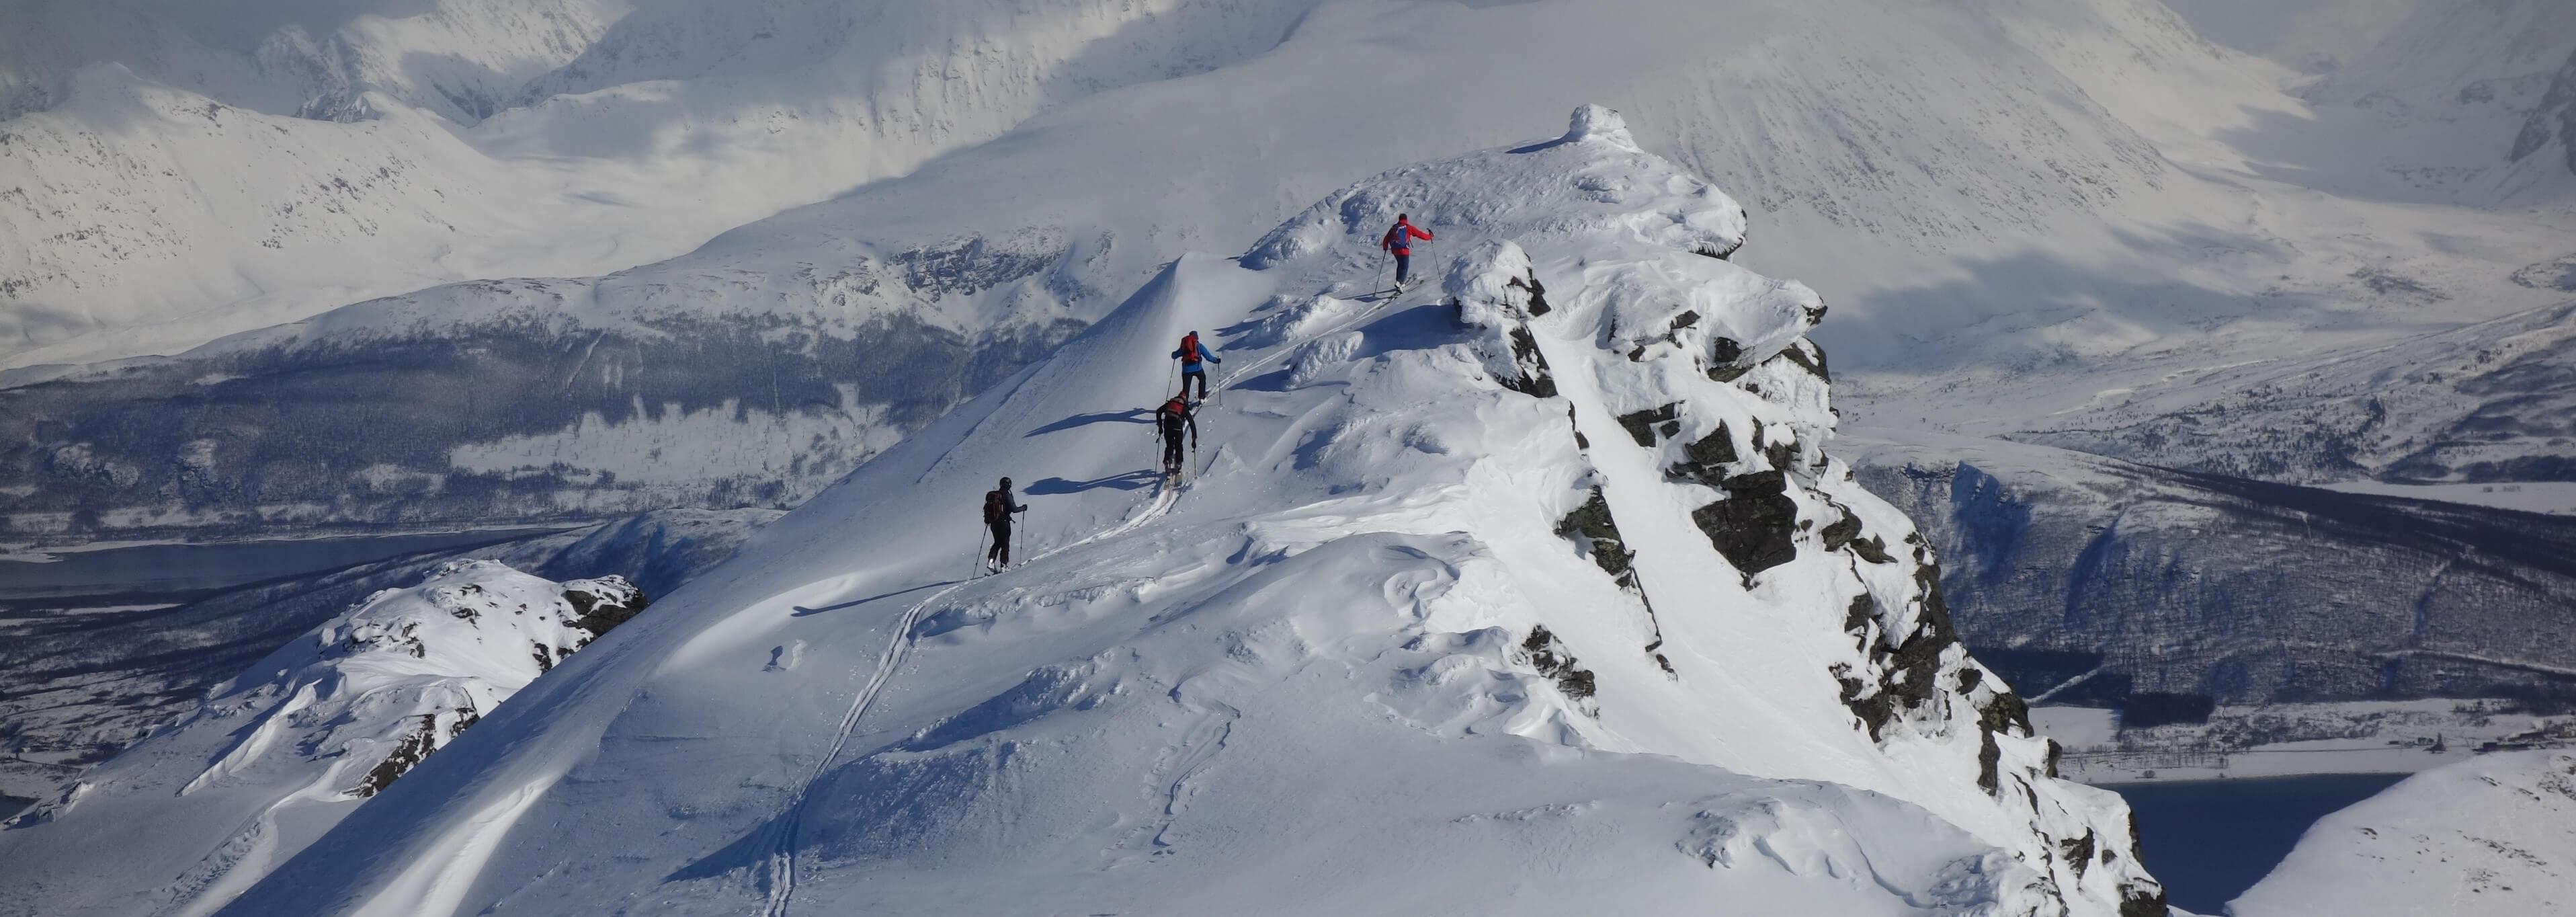 Norwegen Skitouren vom Schiff